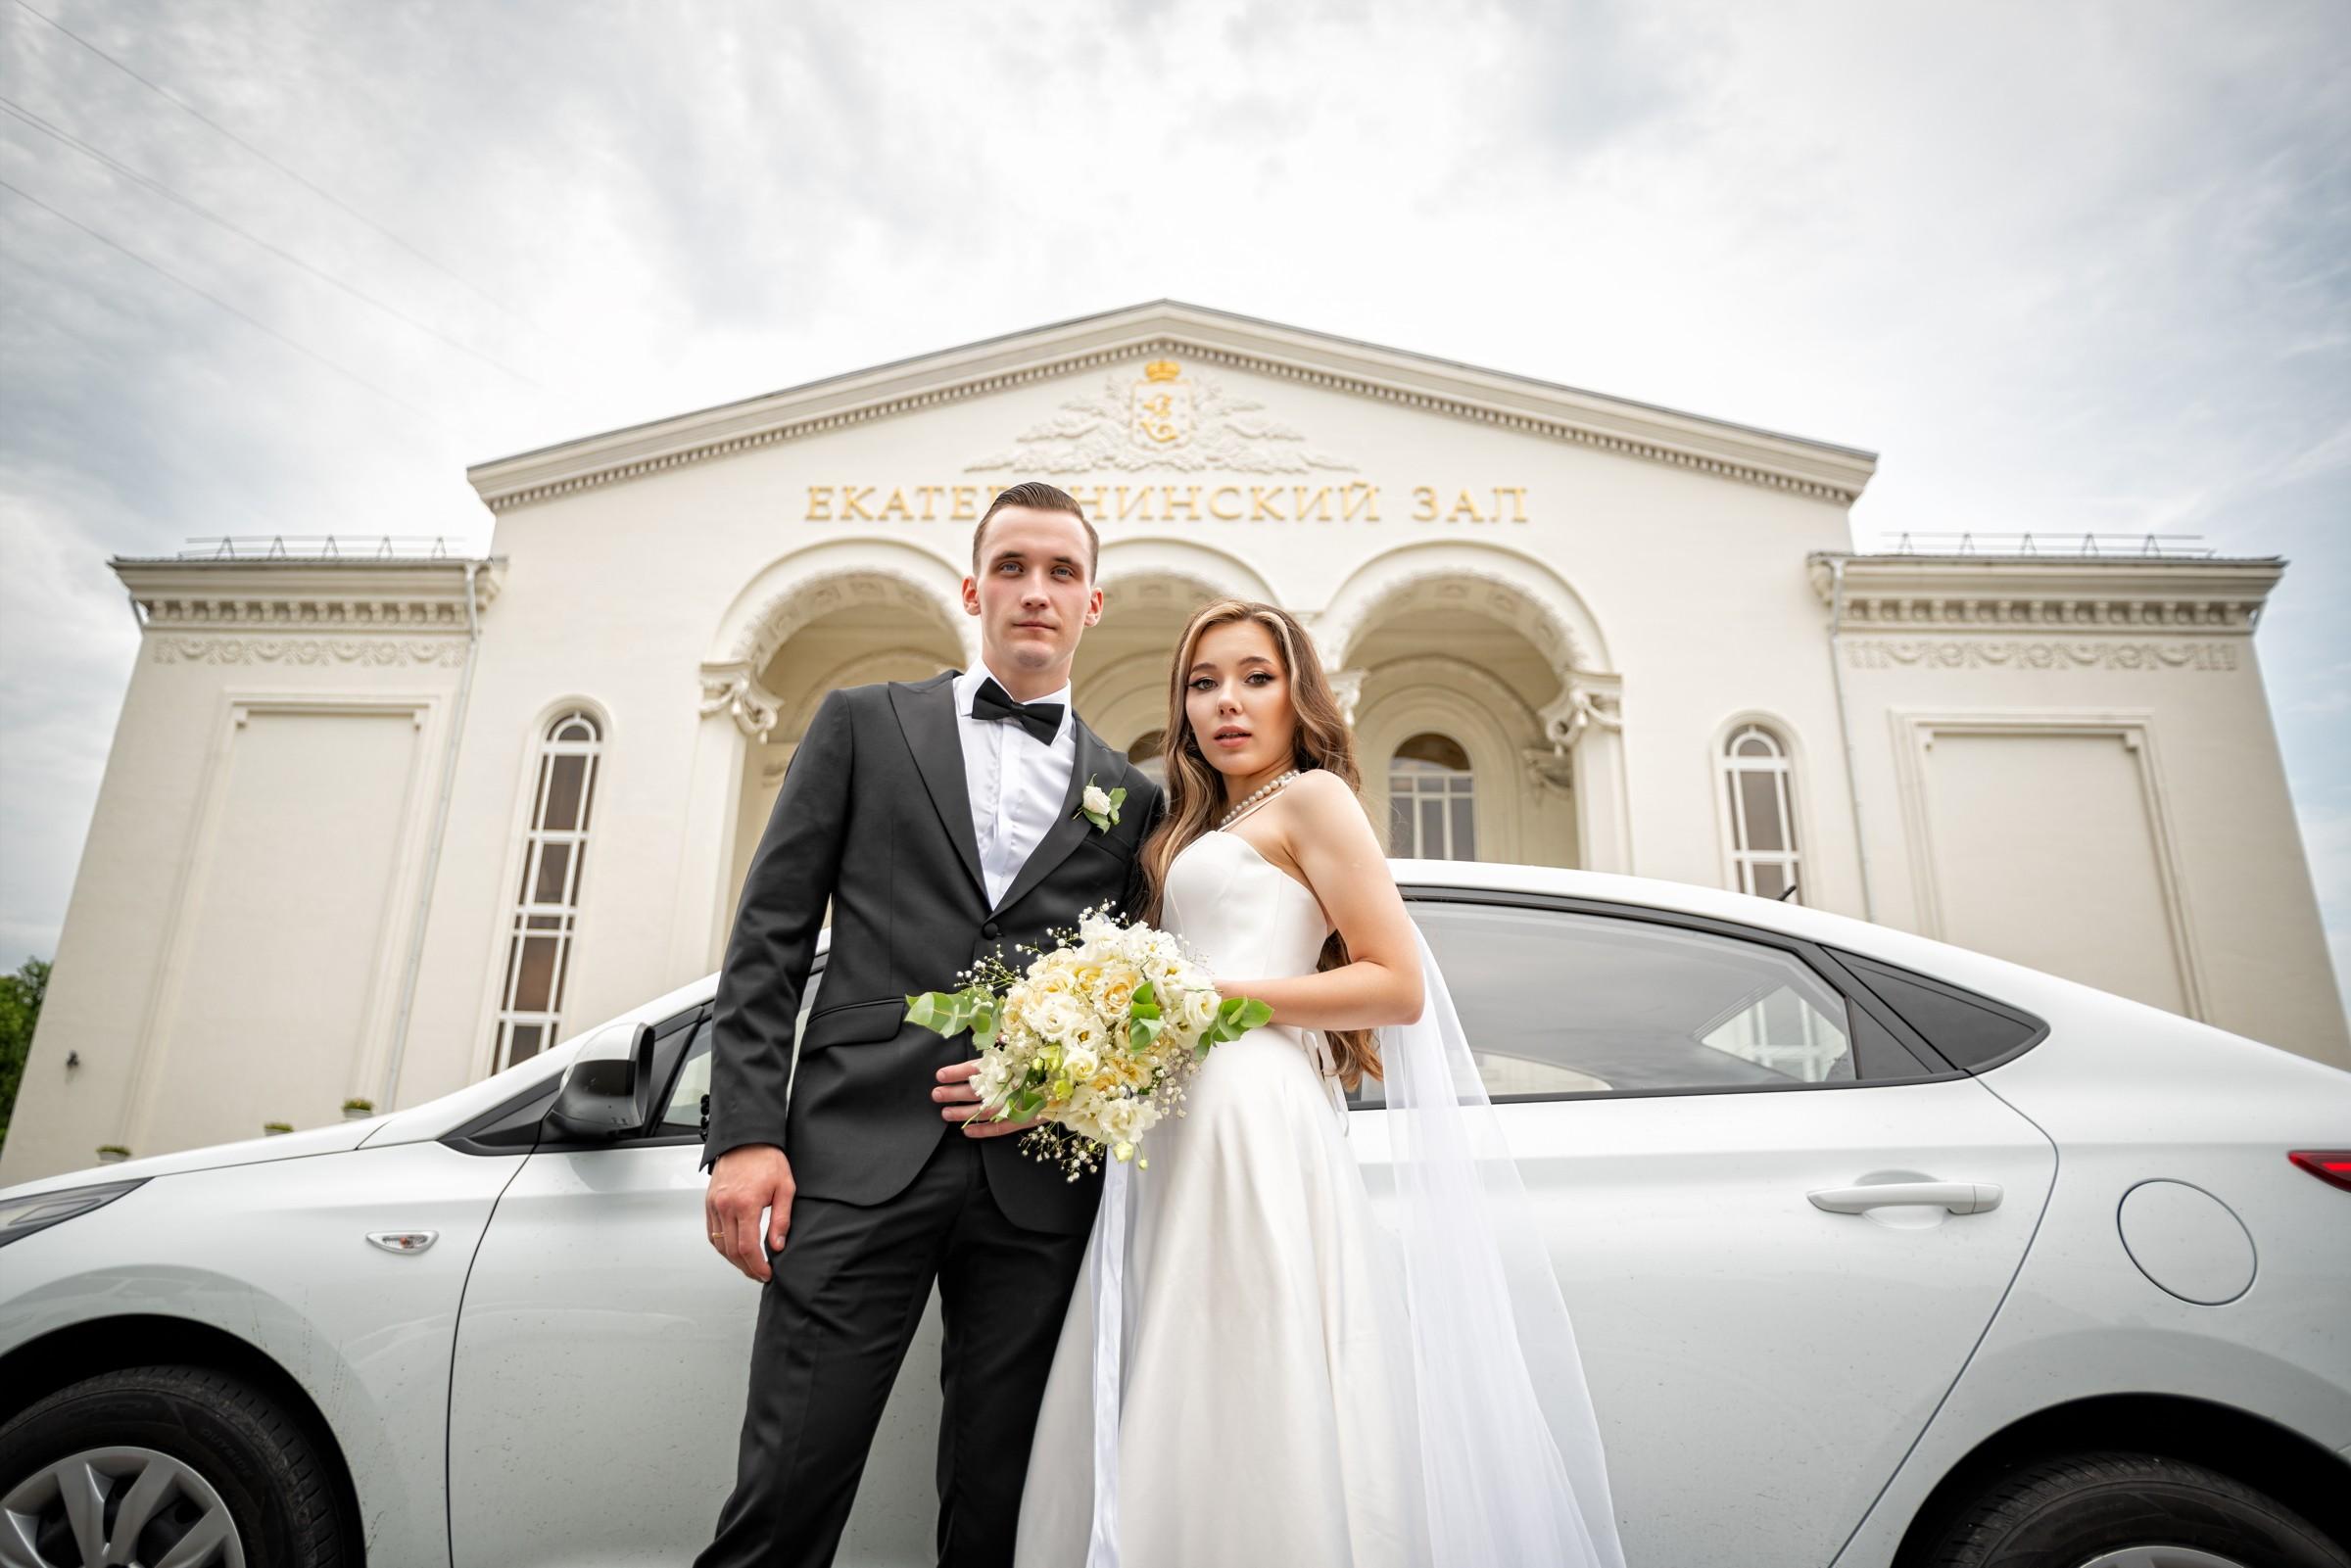 Свадебная фотосъемка в ЗАГСе Екатерининский Зал Краснодар от свадебного фотографа. Съемка перед ЗАГСом